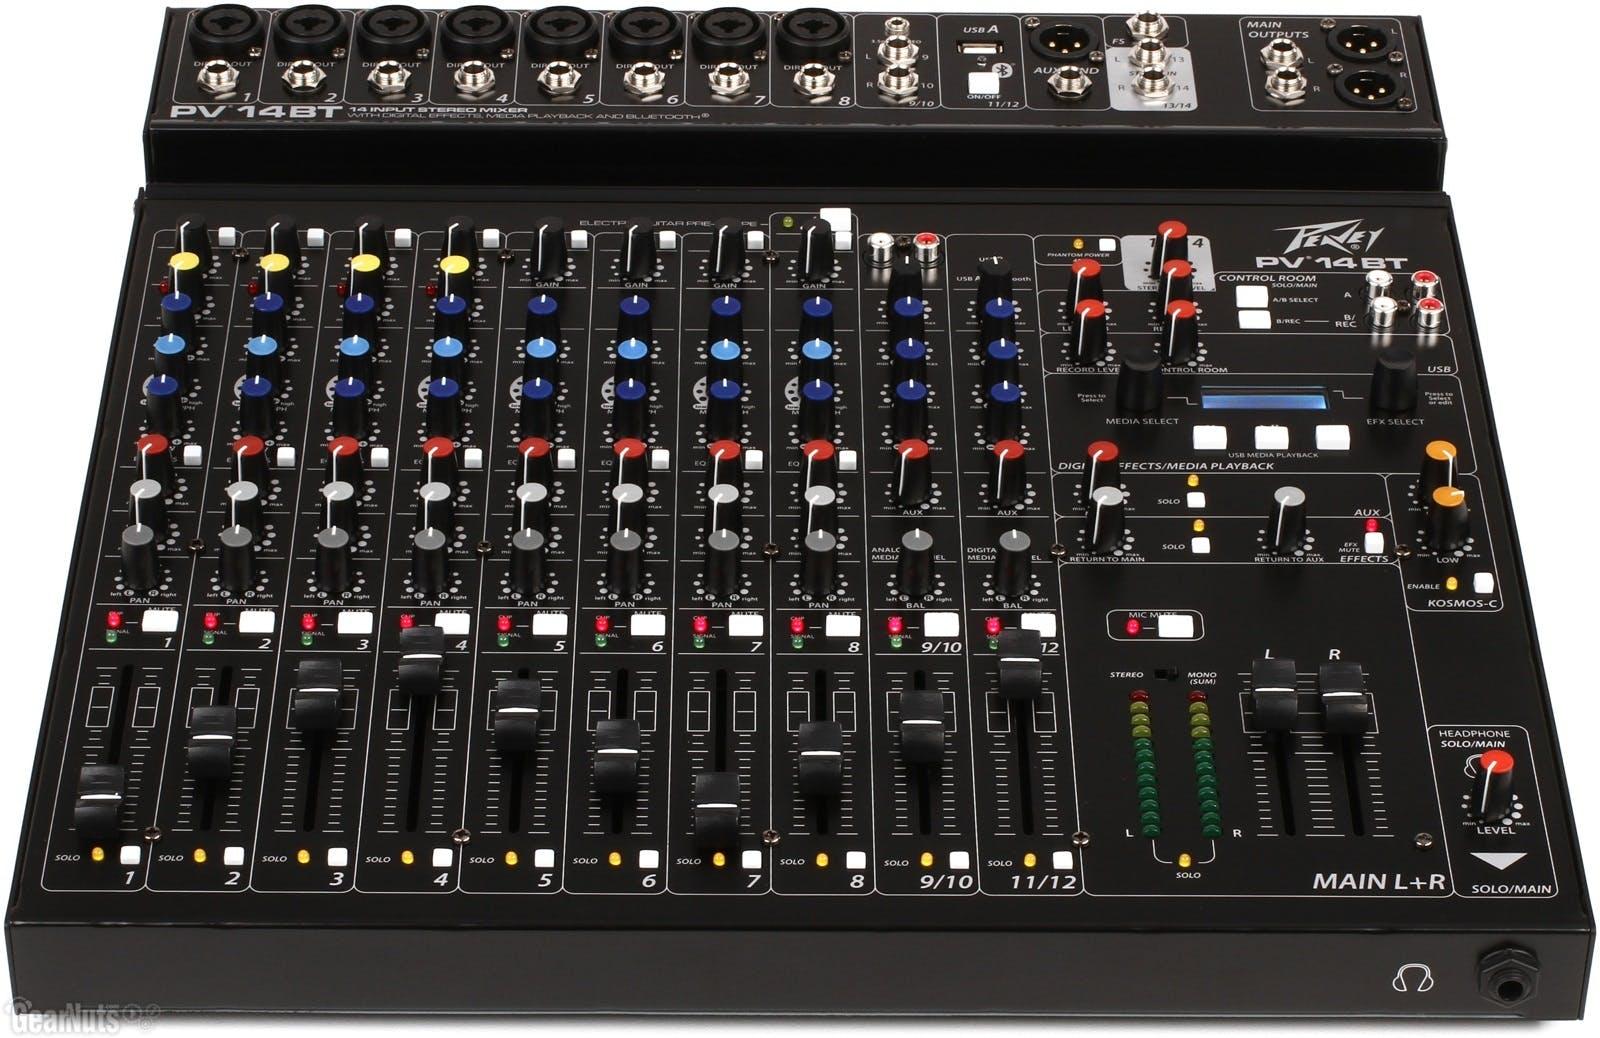 Peavey Pv14bt Mixer With Bluetooth Andertons Music Co Yamaha Mgp12x